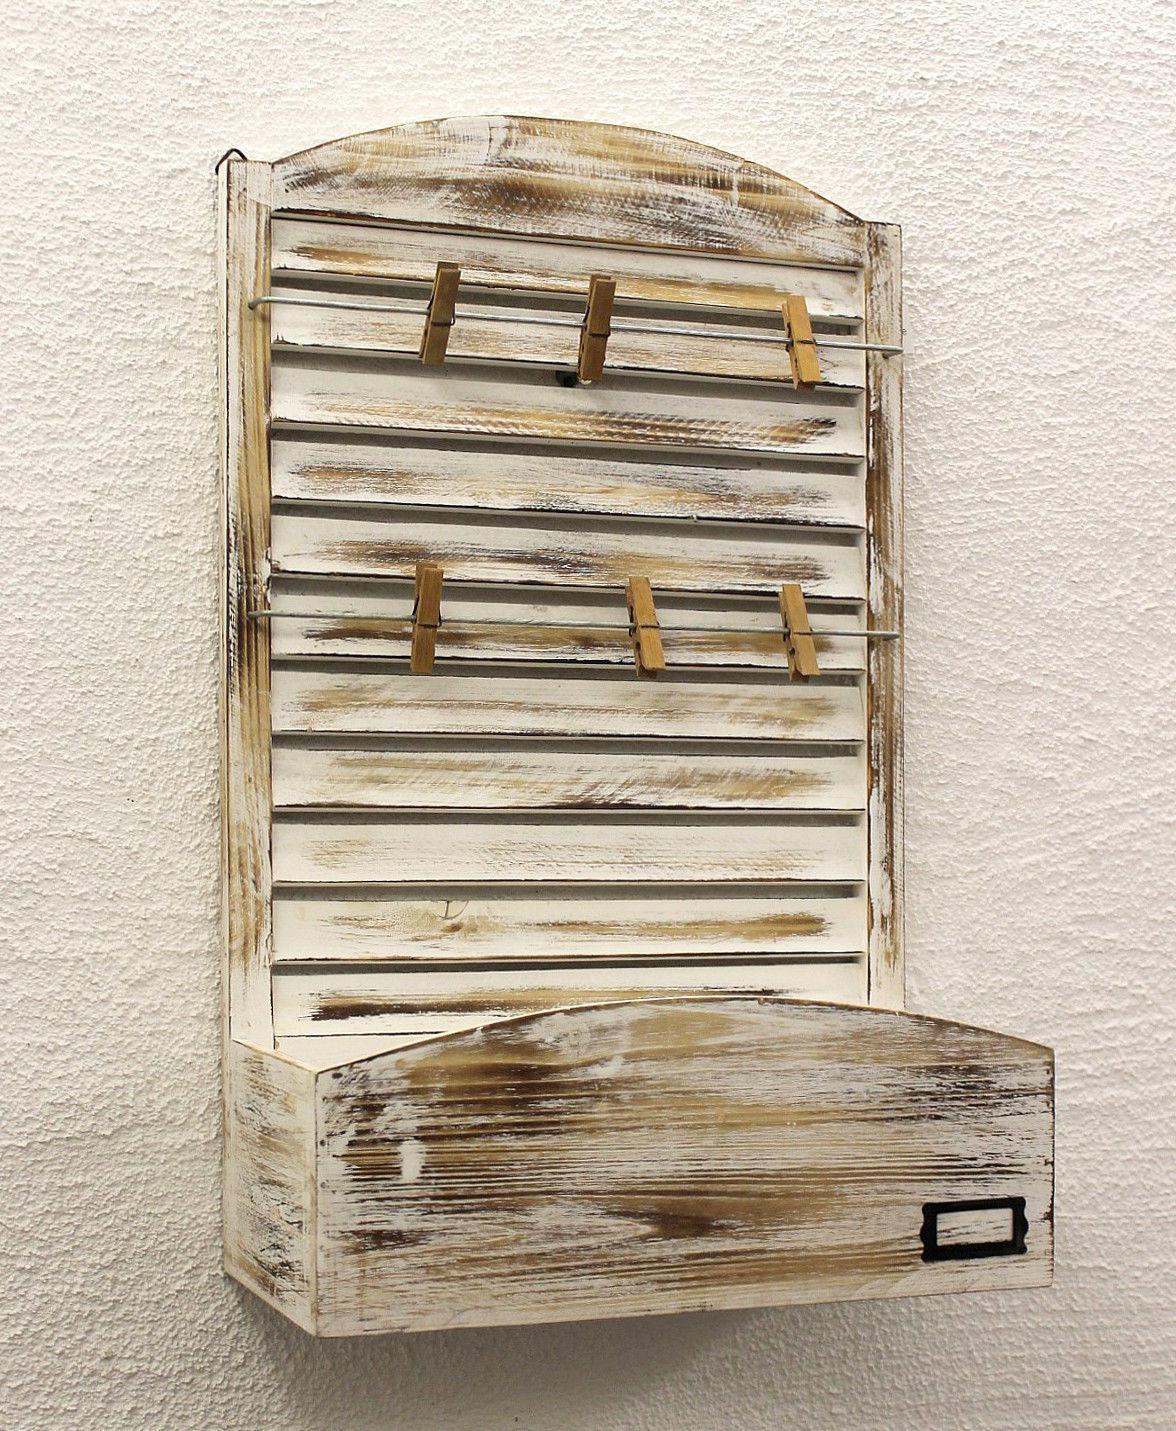 memoboard mit briefablage yx 14b415 pinnwand 65 cm wandregal memotafel shabby ebay. Black Bedroom Furniture Sets. Home Design Ideas